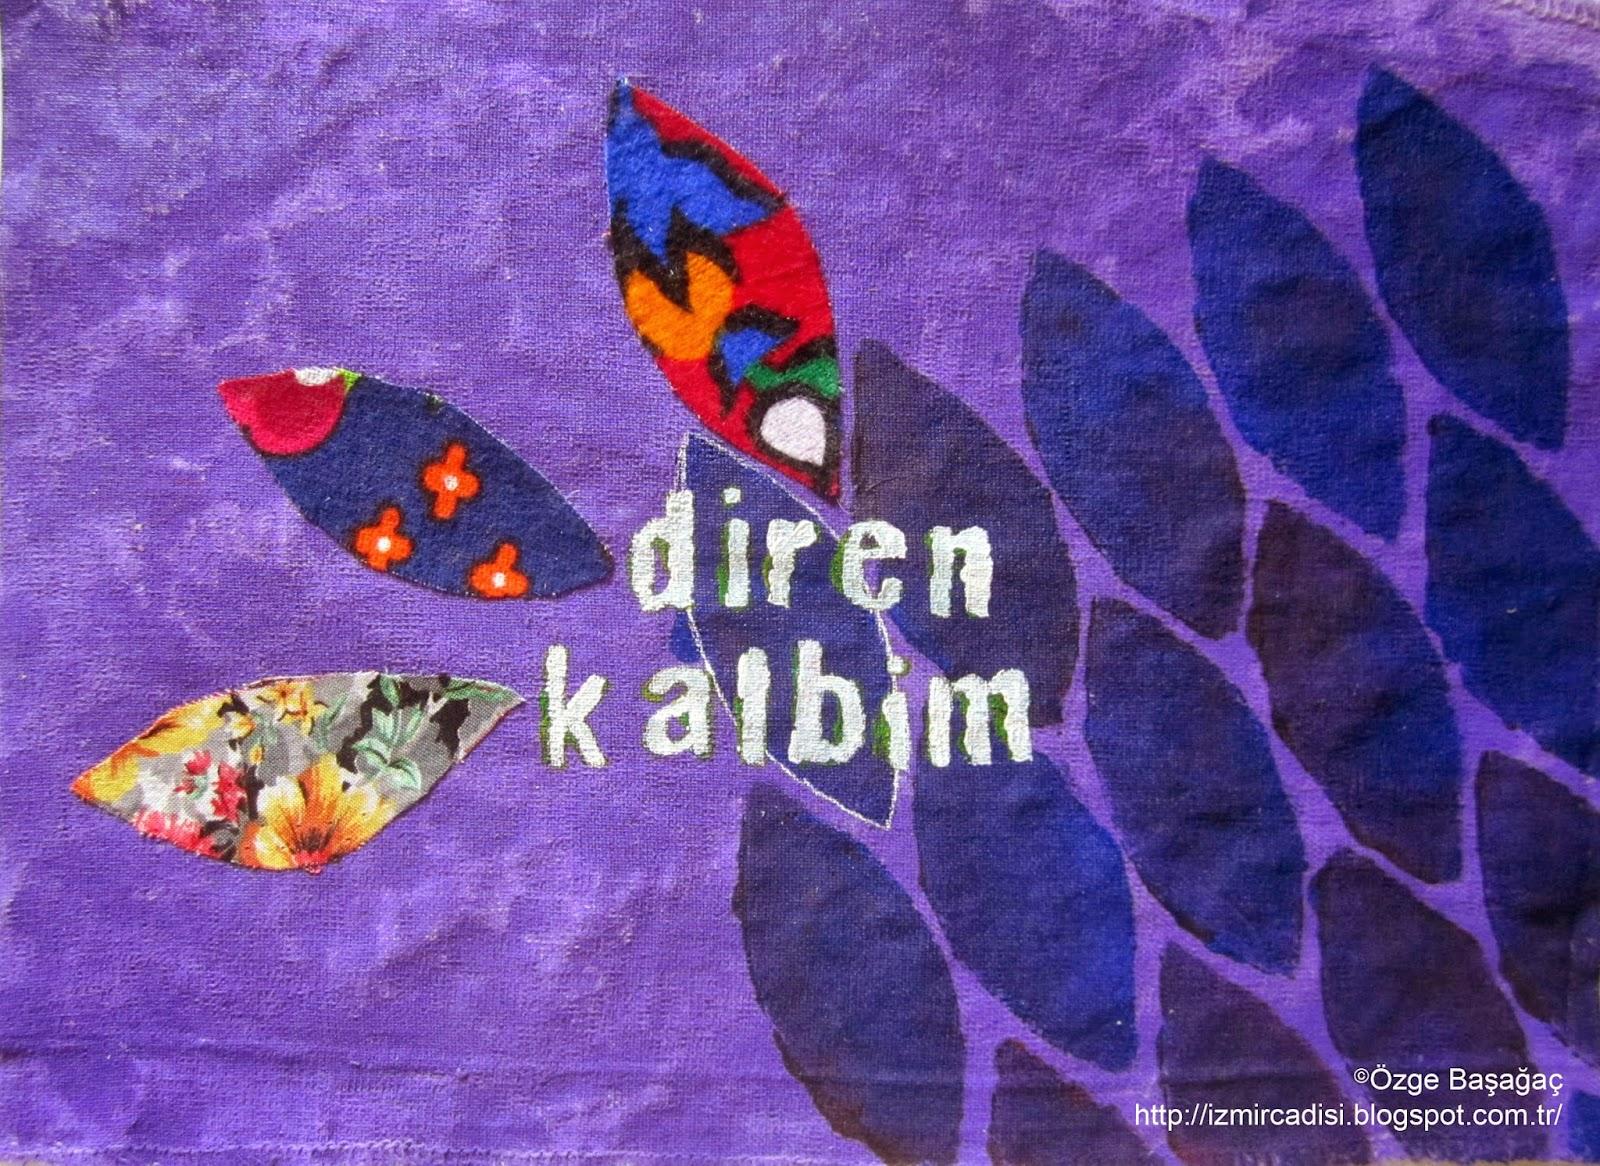 http://izmircadisi.blogspot.com.tr/2015/03/52-haftada-bask-yapmak-4-hafta-52-weeks.html